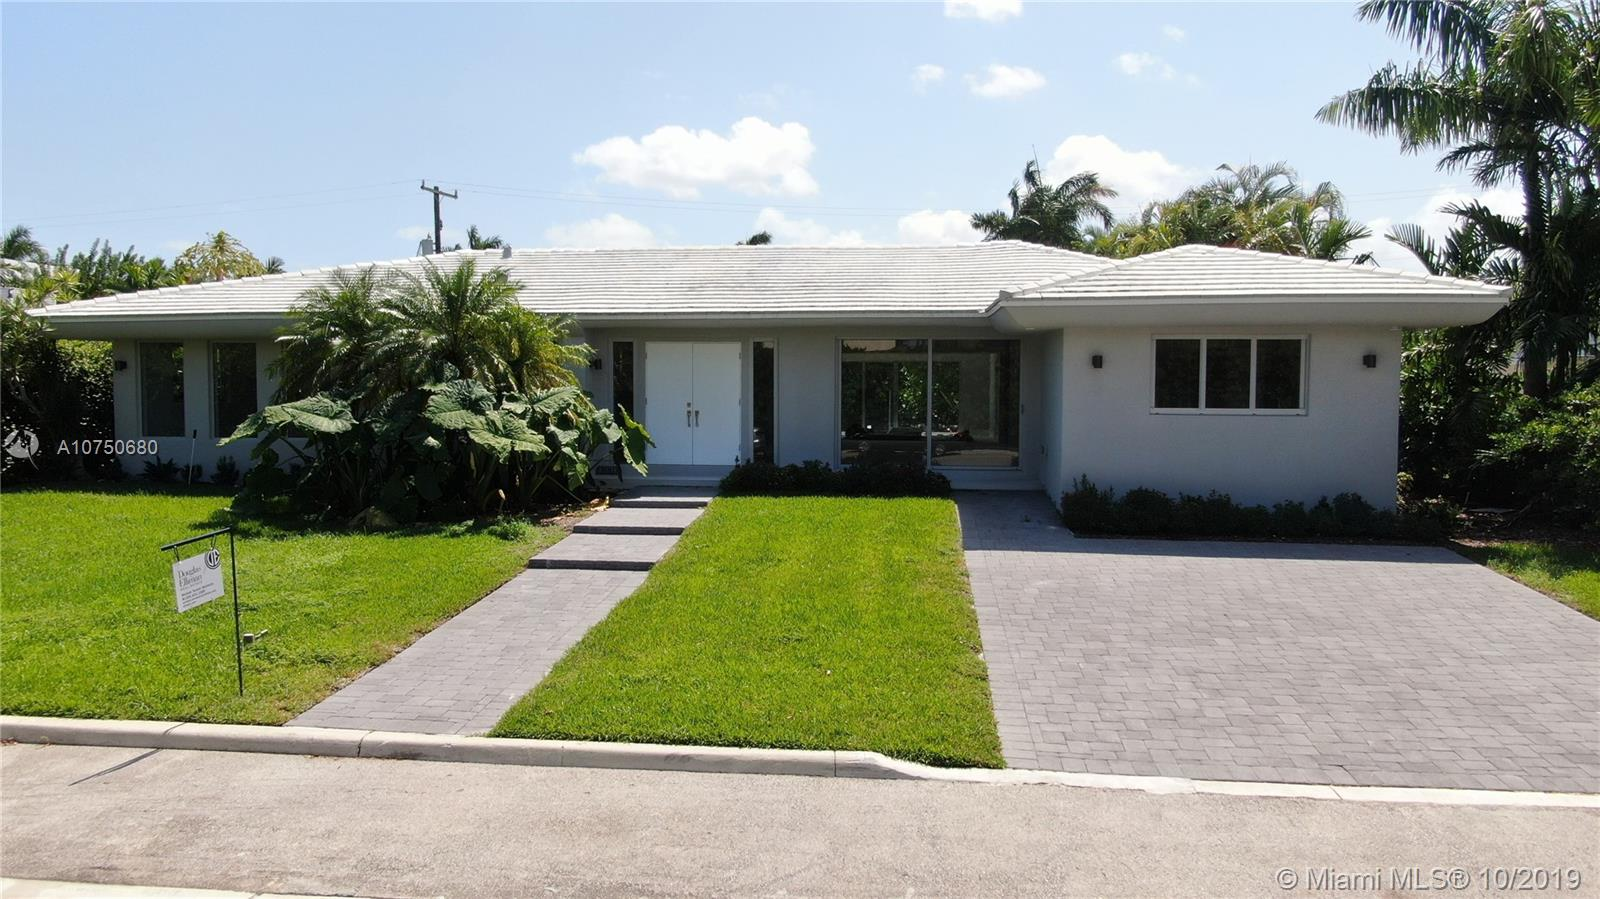 1330 100th St - Bay Harbor Islands, Florida